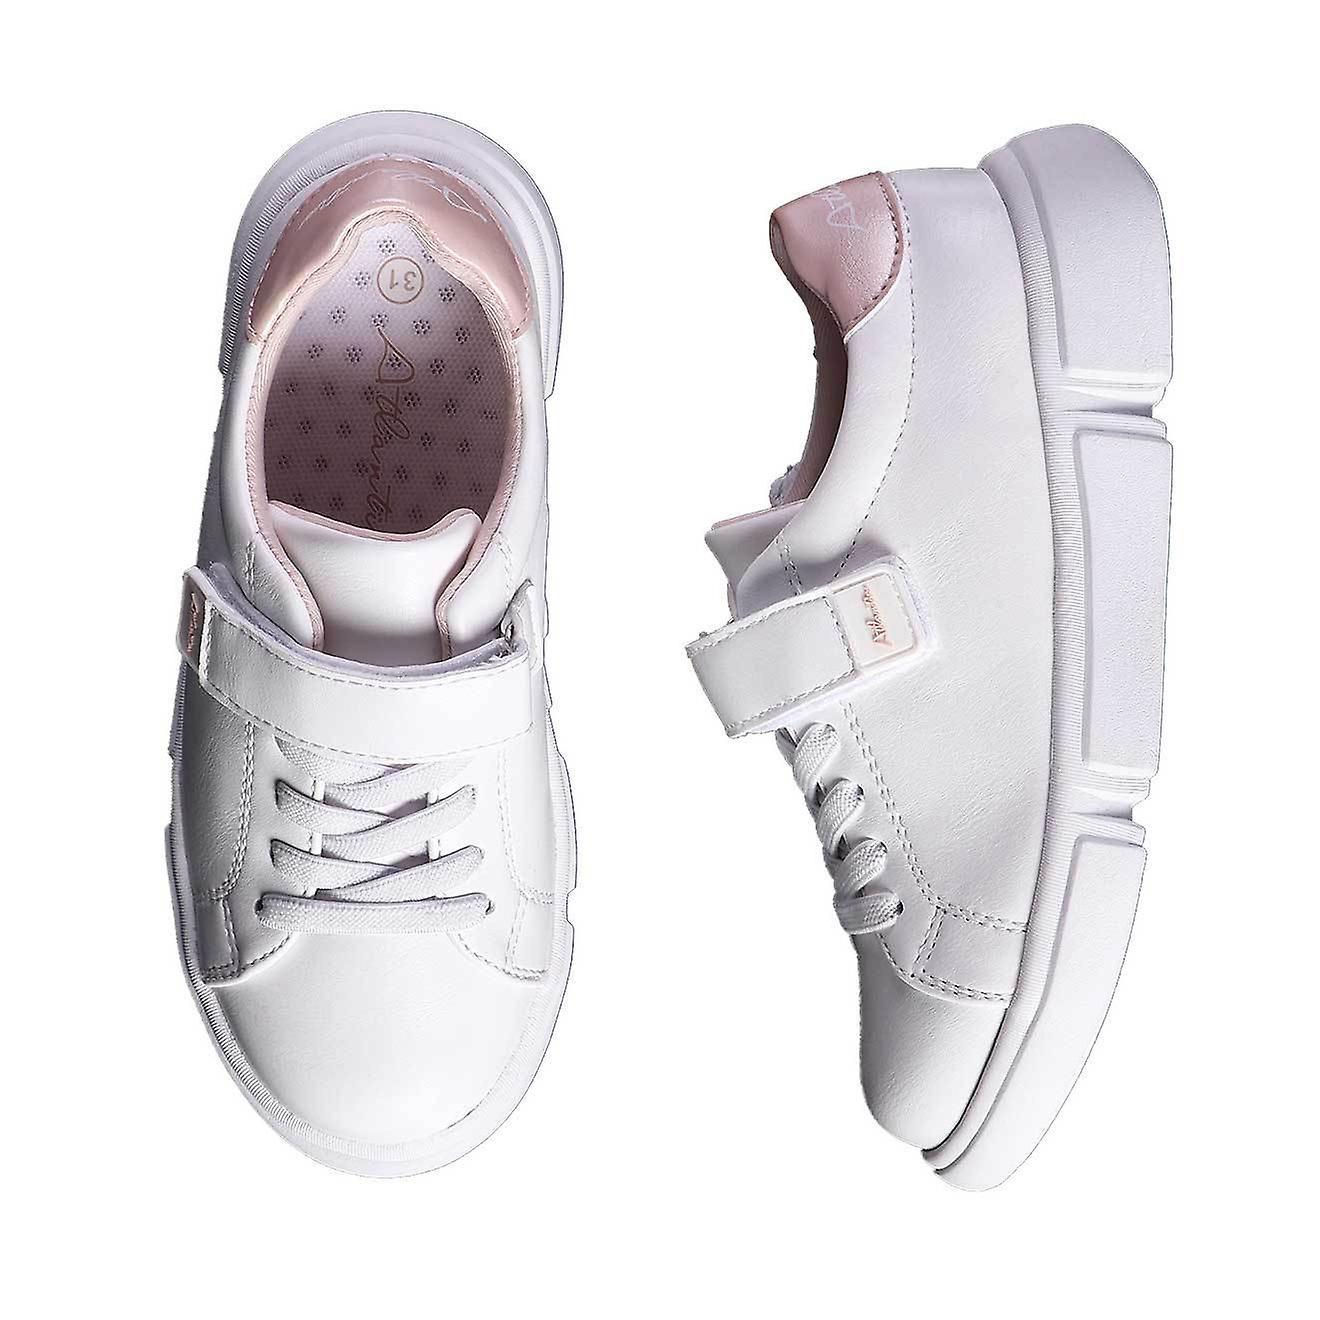 Babycakes junior sneakers white